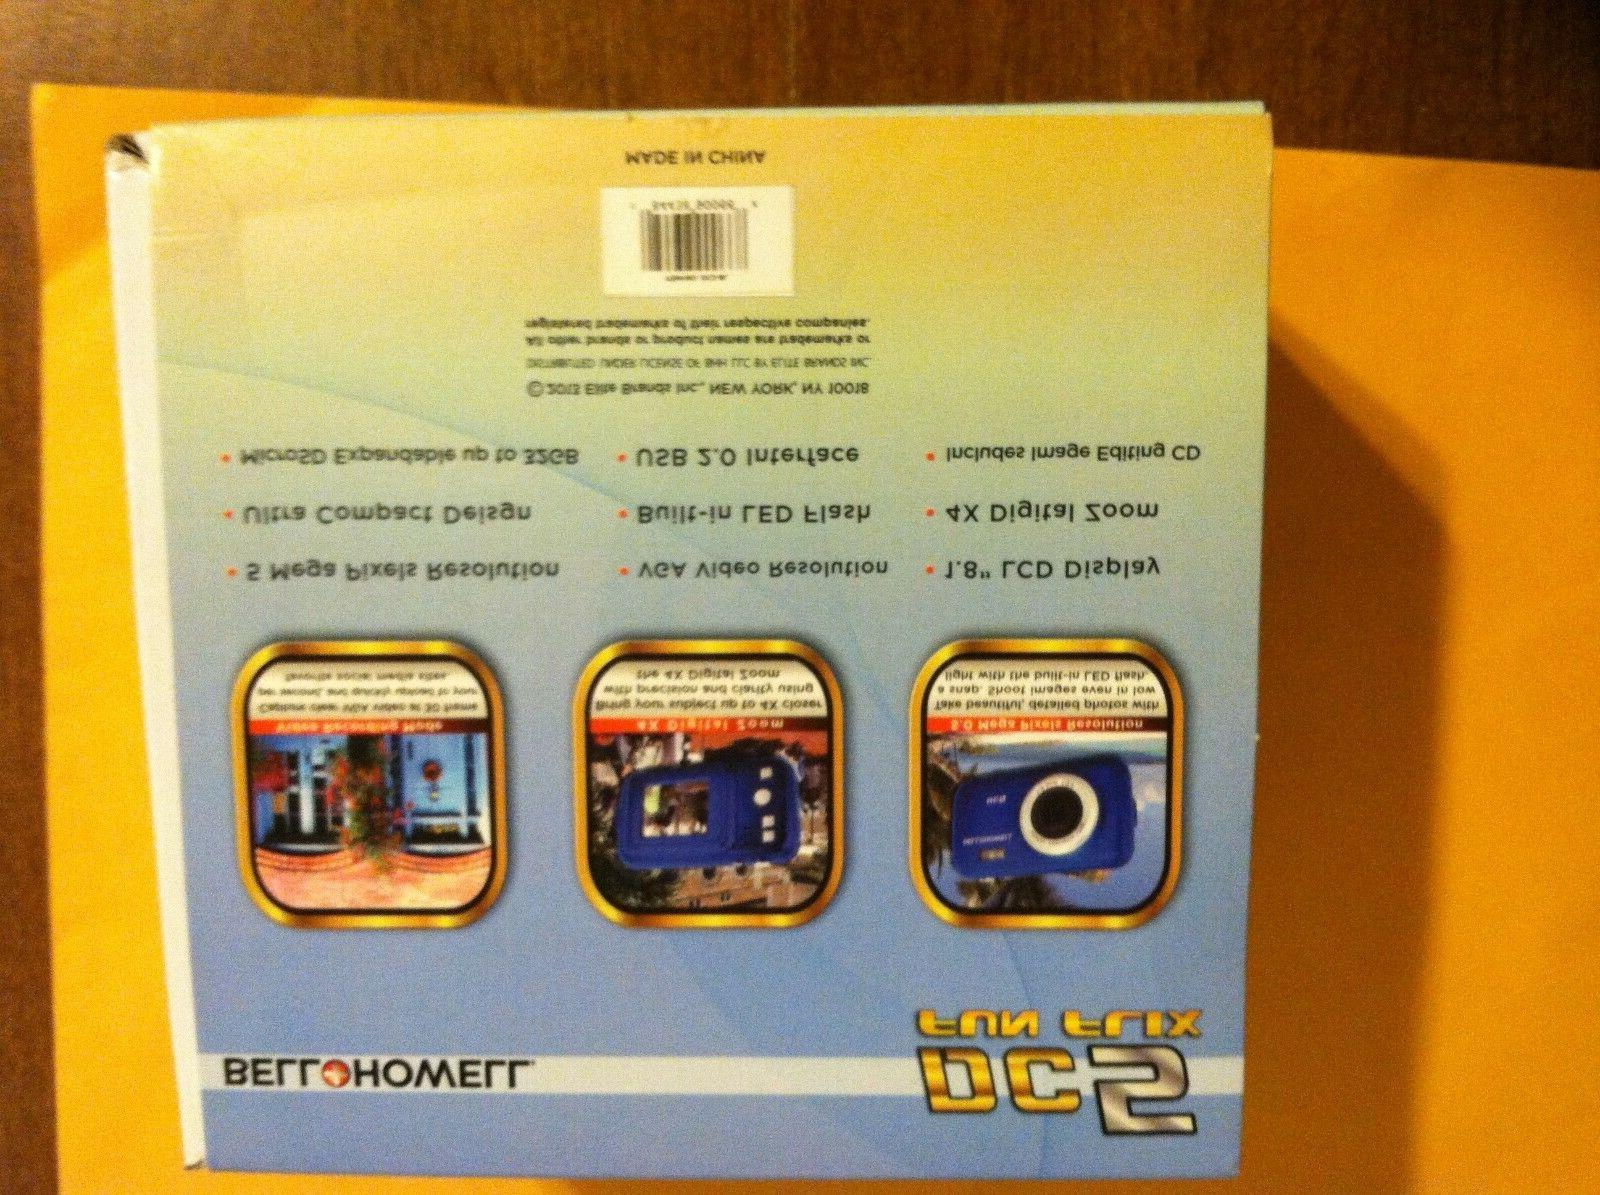 Bell Howell Fun-Flix 5.0MP Camera - Blue